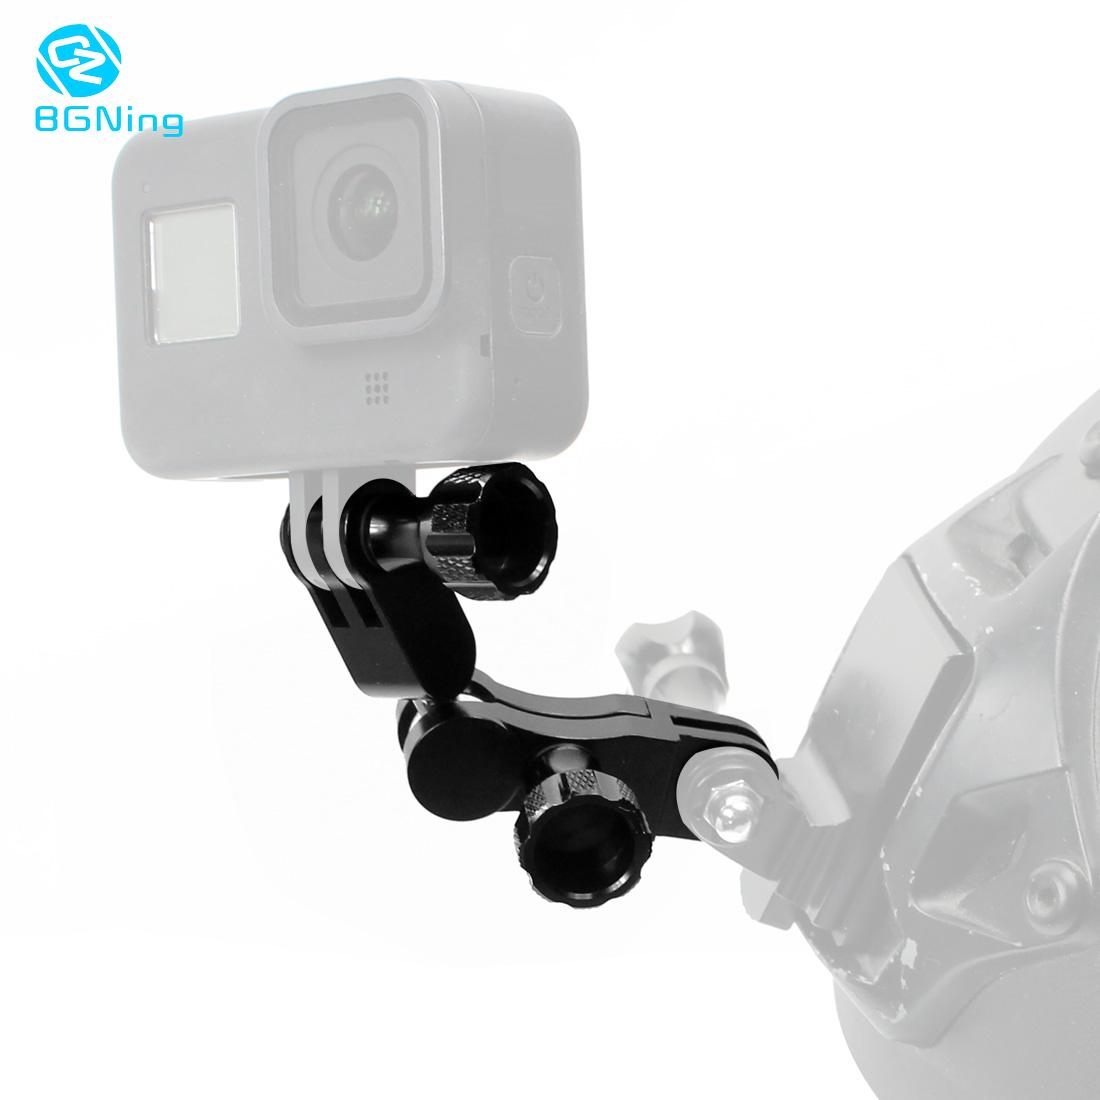 BGNing Aluminium 360 Degree Rotating Joint Adapter Mount for Gopro Hero 8 7 6 5 Session XiaoYi SJCAM SJ4000 Action Cam Accessory